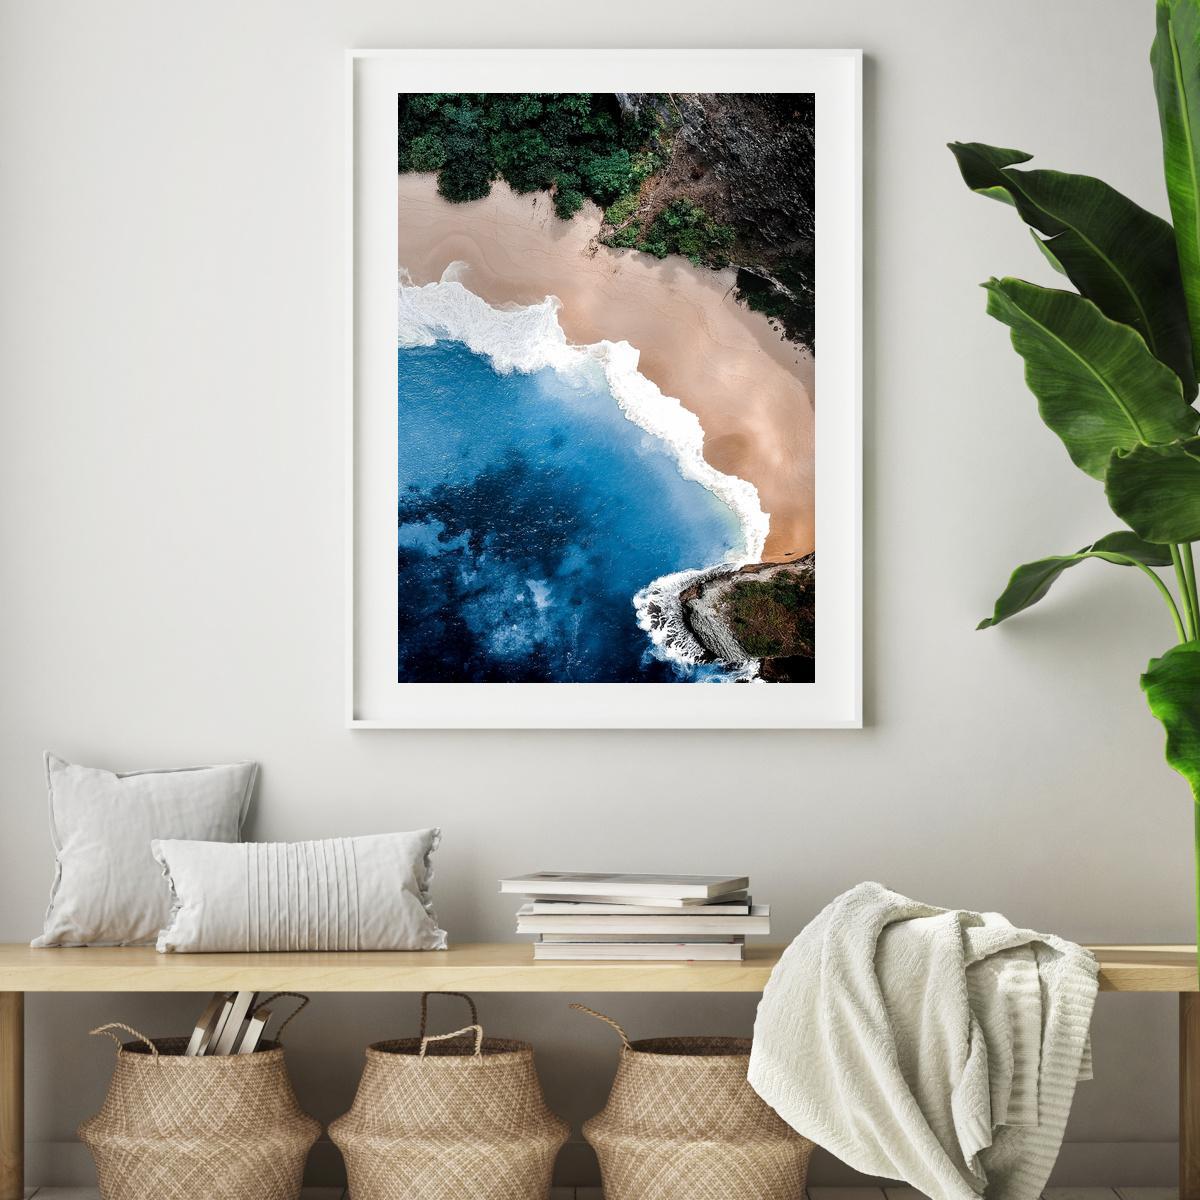 Plakat - Ocean, pijesak, greben (S040027SA4)